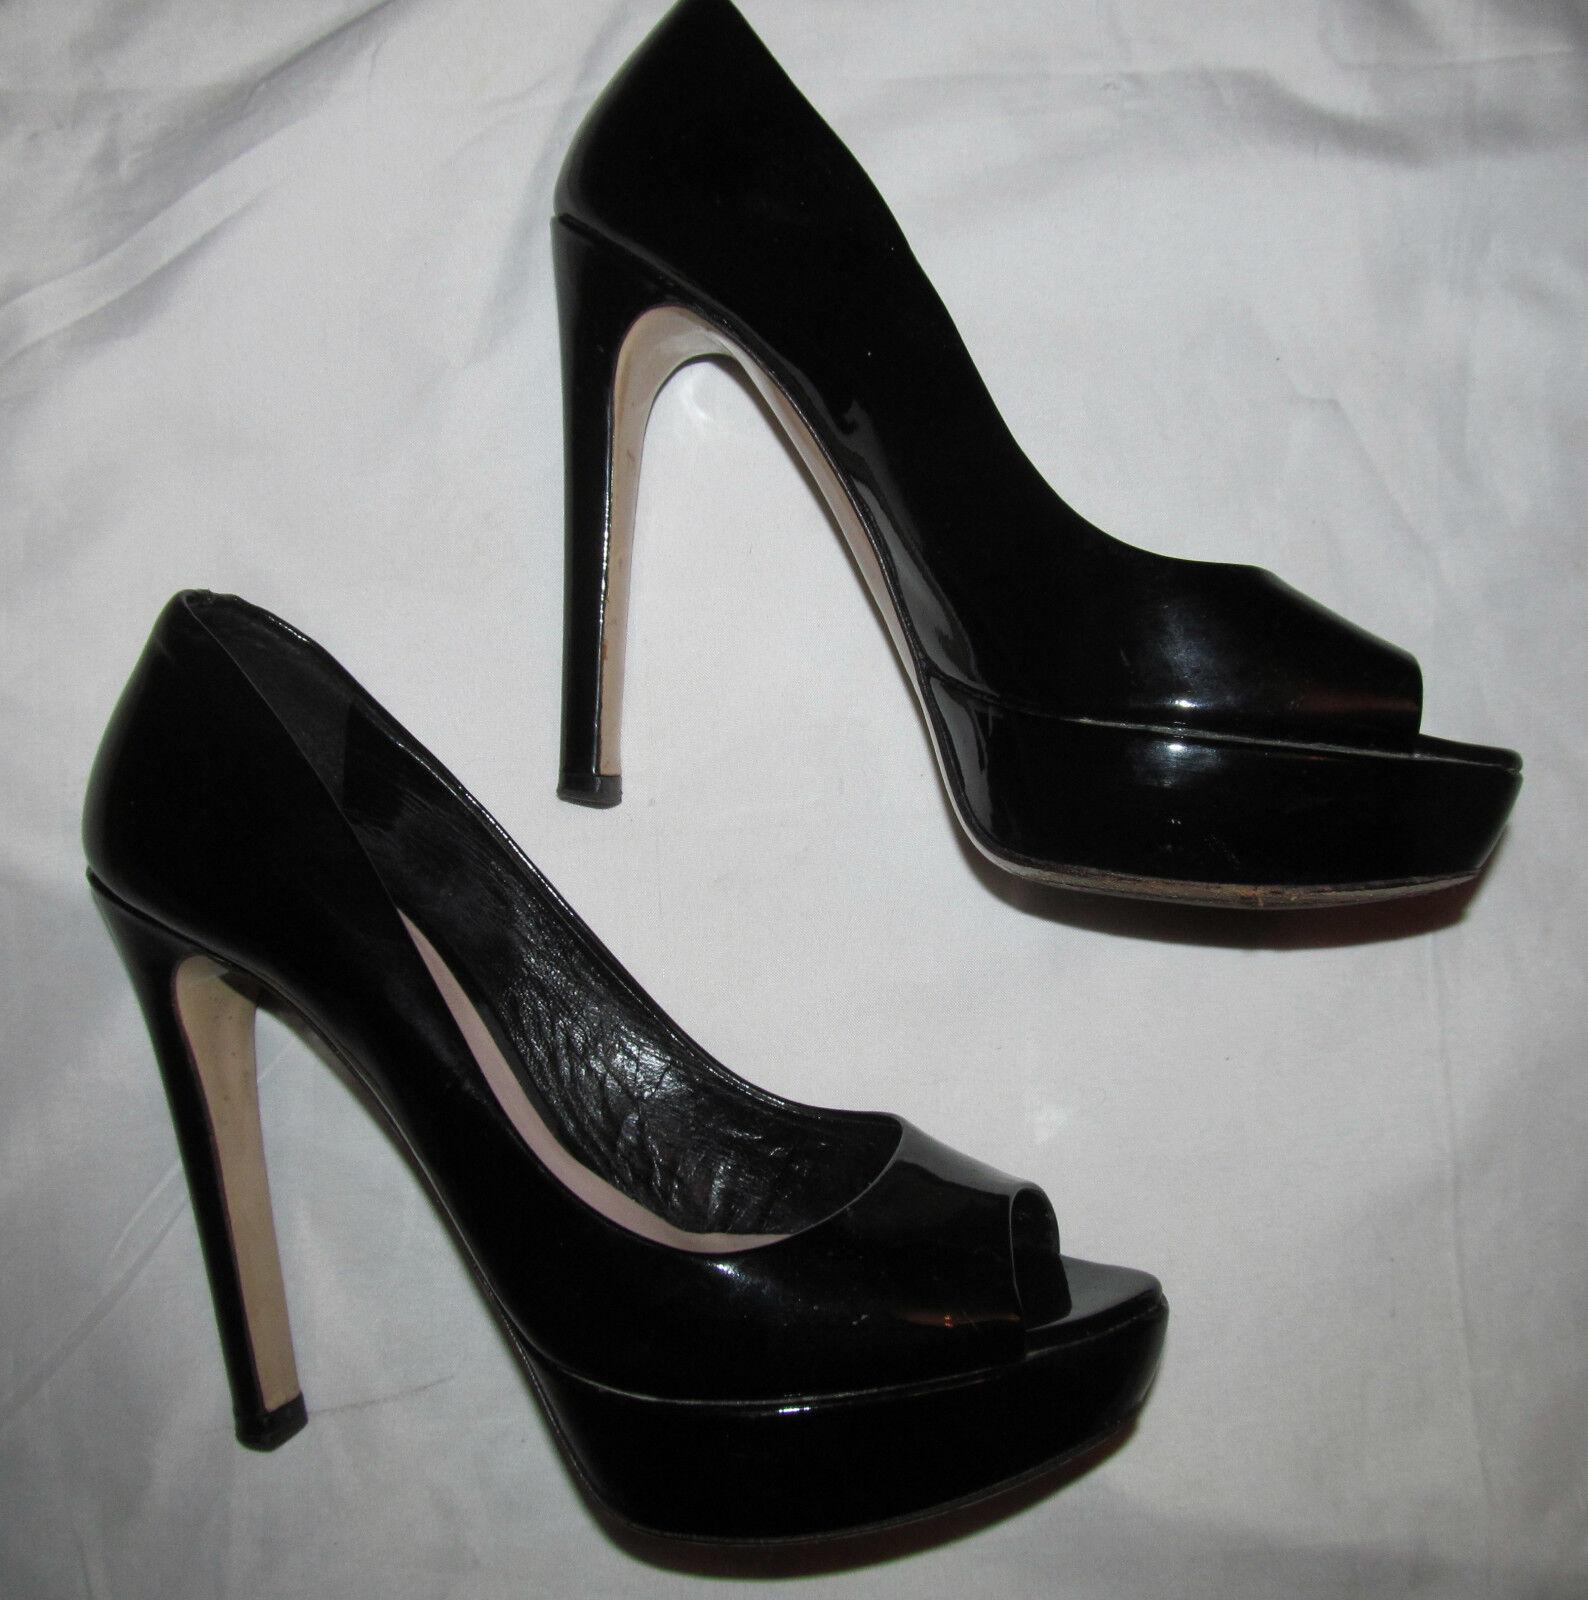 MIU MIU PRADA patent leather vamp platform stiletto peep toe dom shoes 36.5 6.5